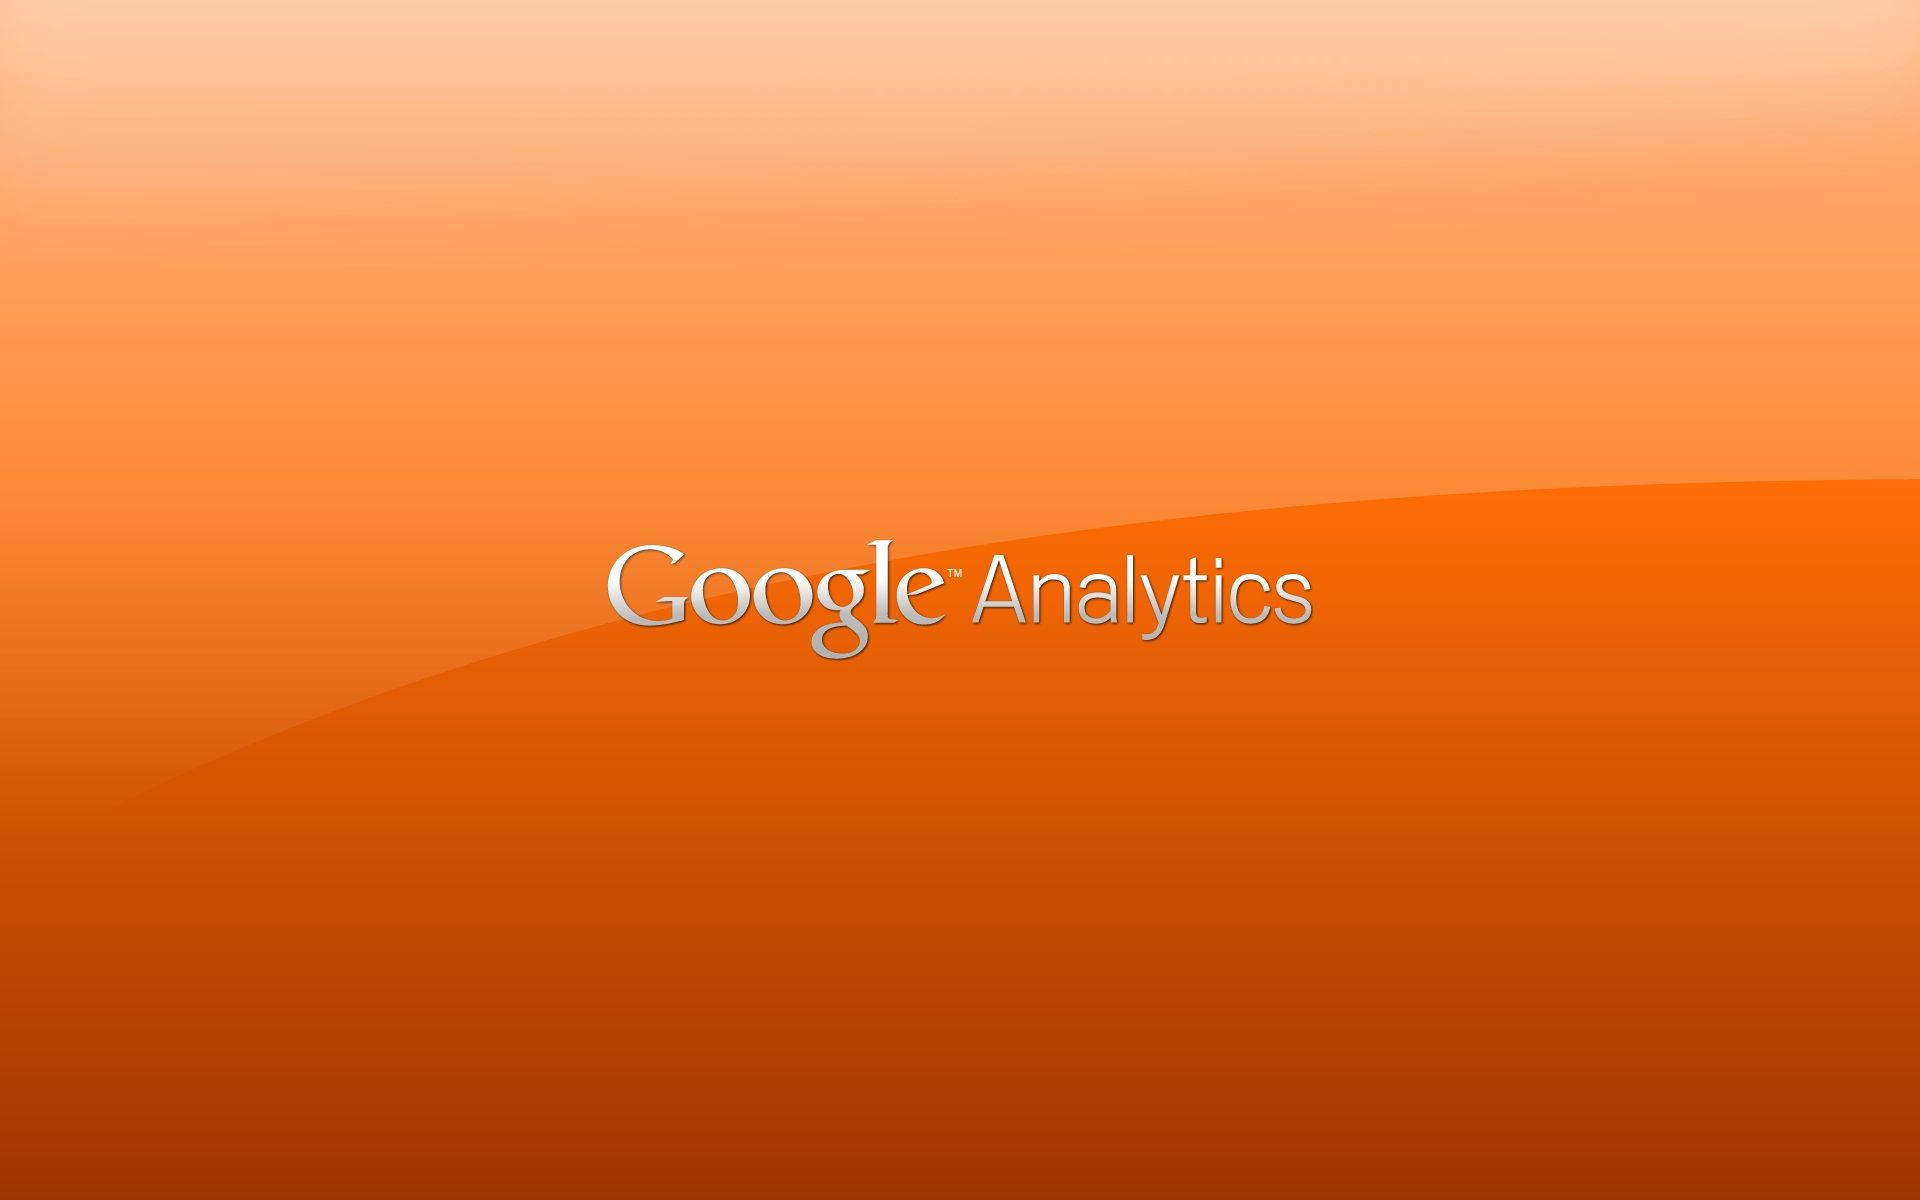 Computer Analytics Google Backgrounds Orange wallpapers HD 1920x1200